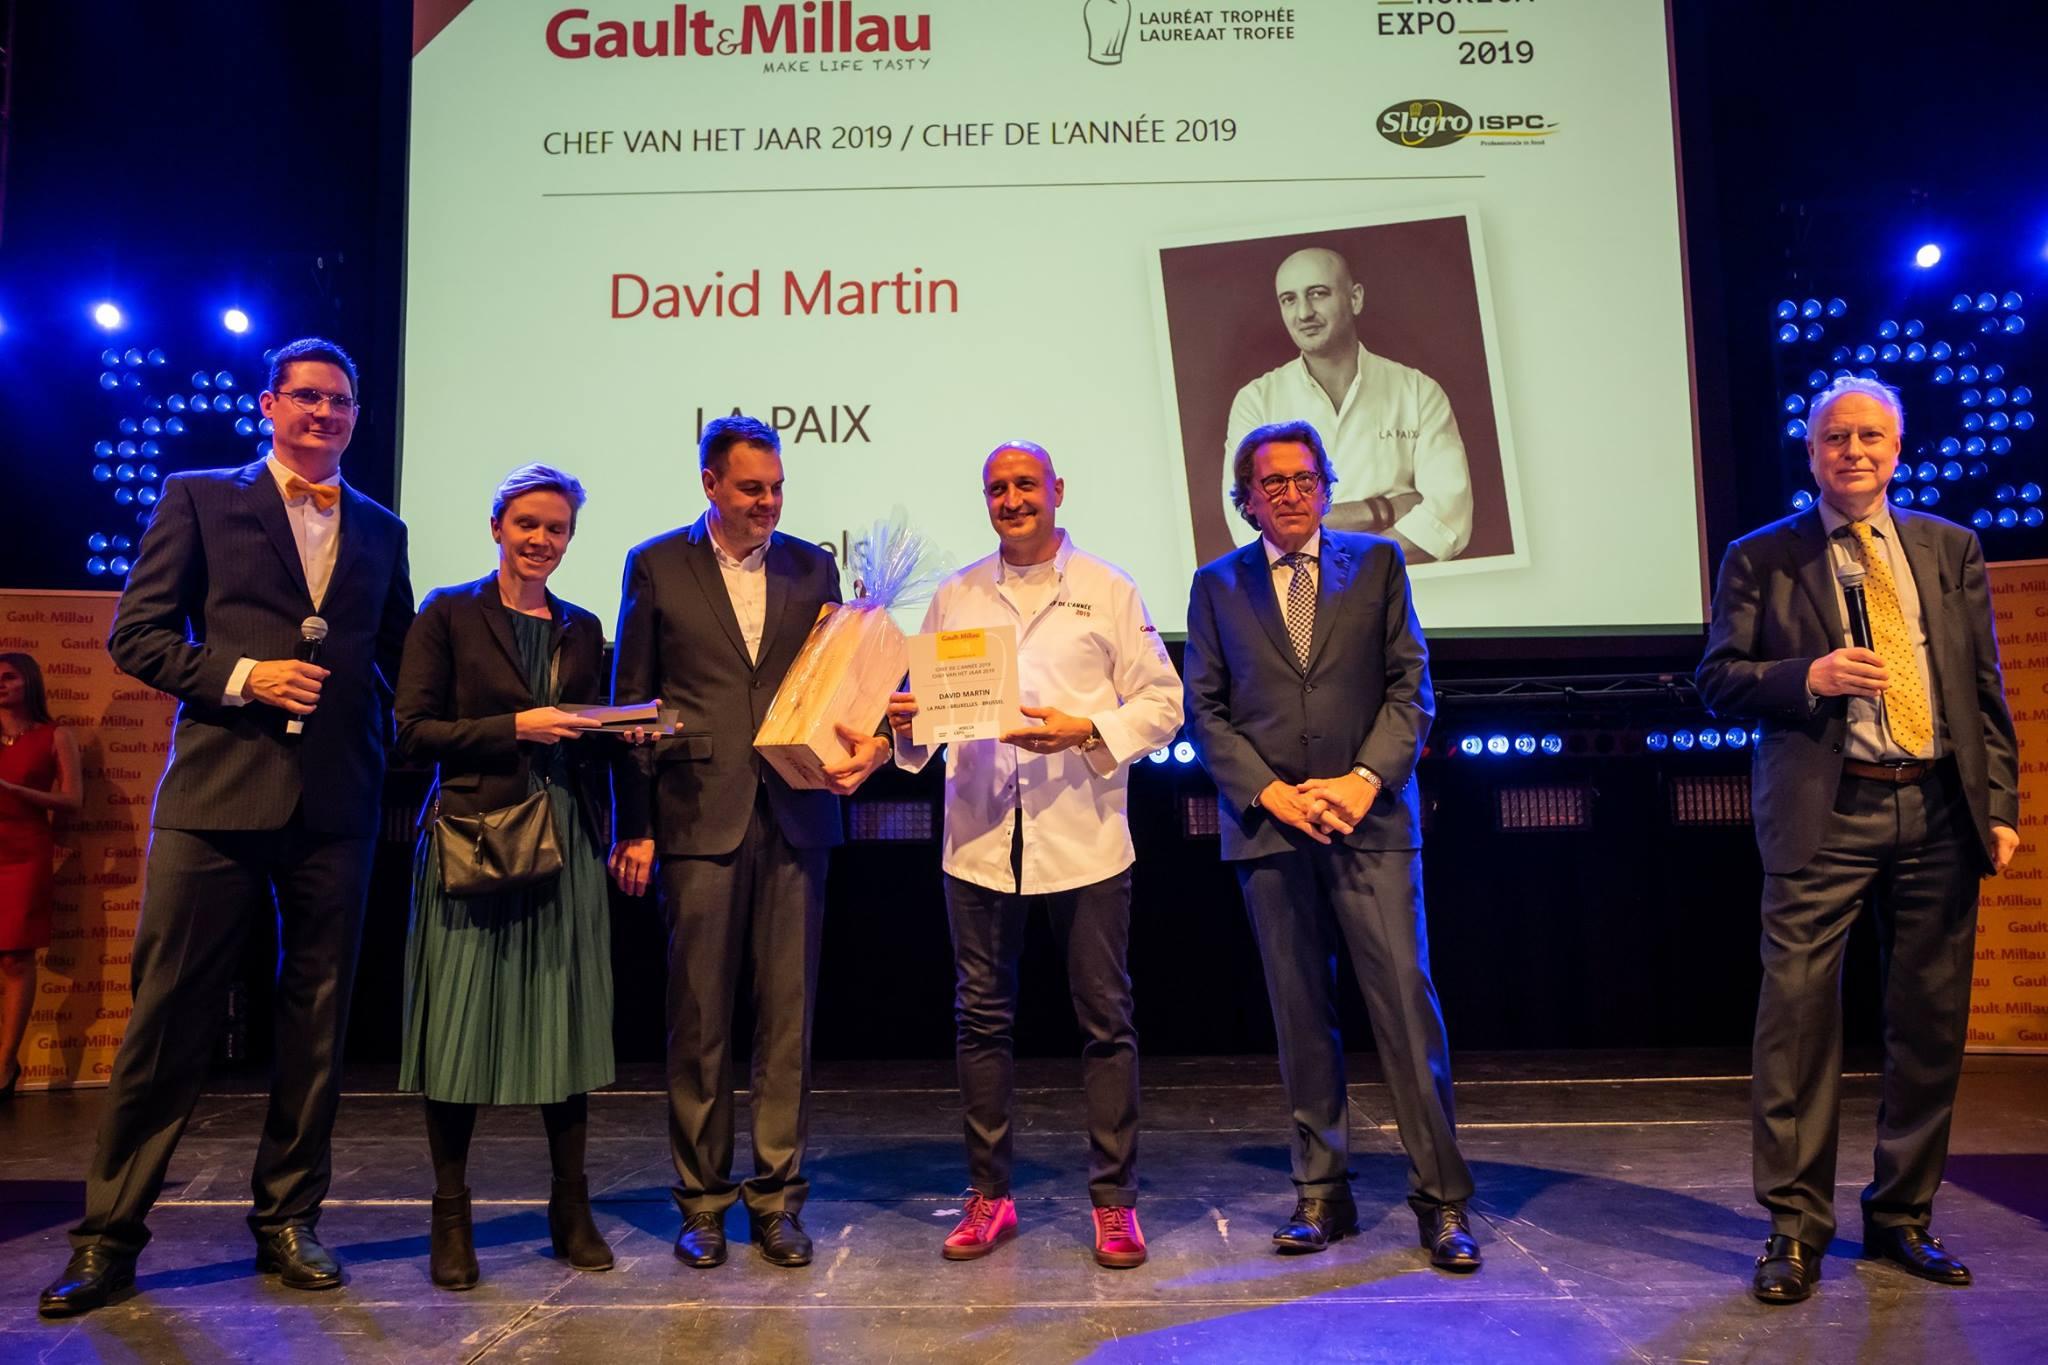 Les grands gagnants de Gault & Millau 2019